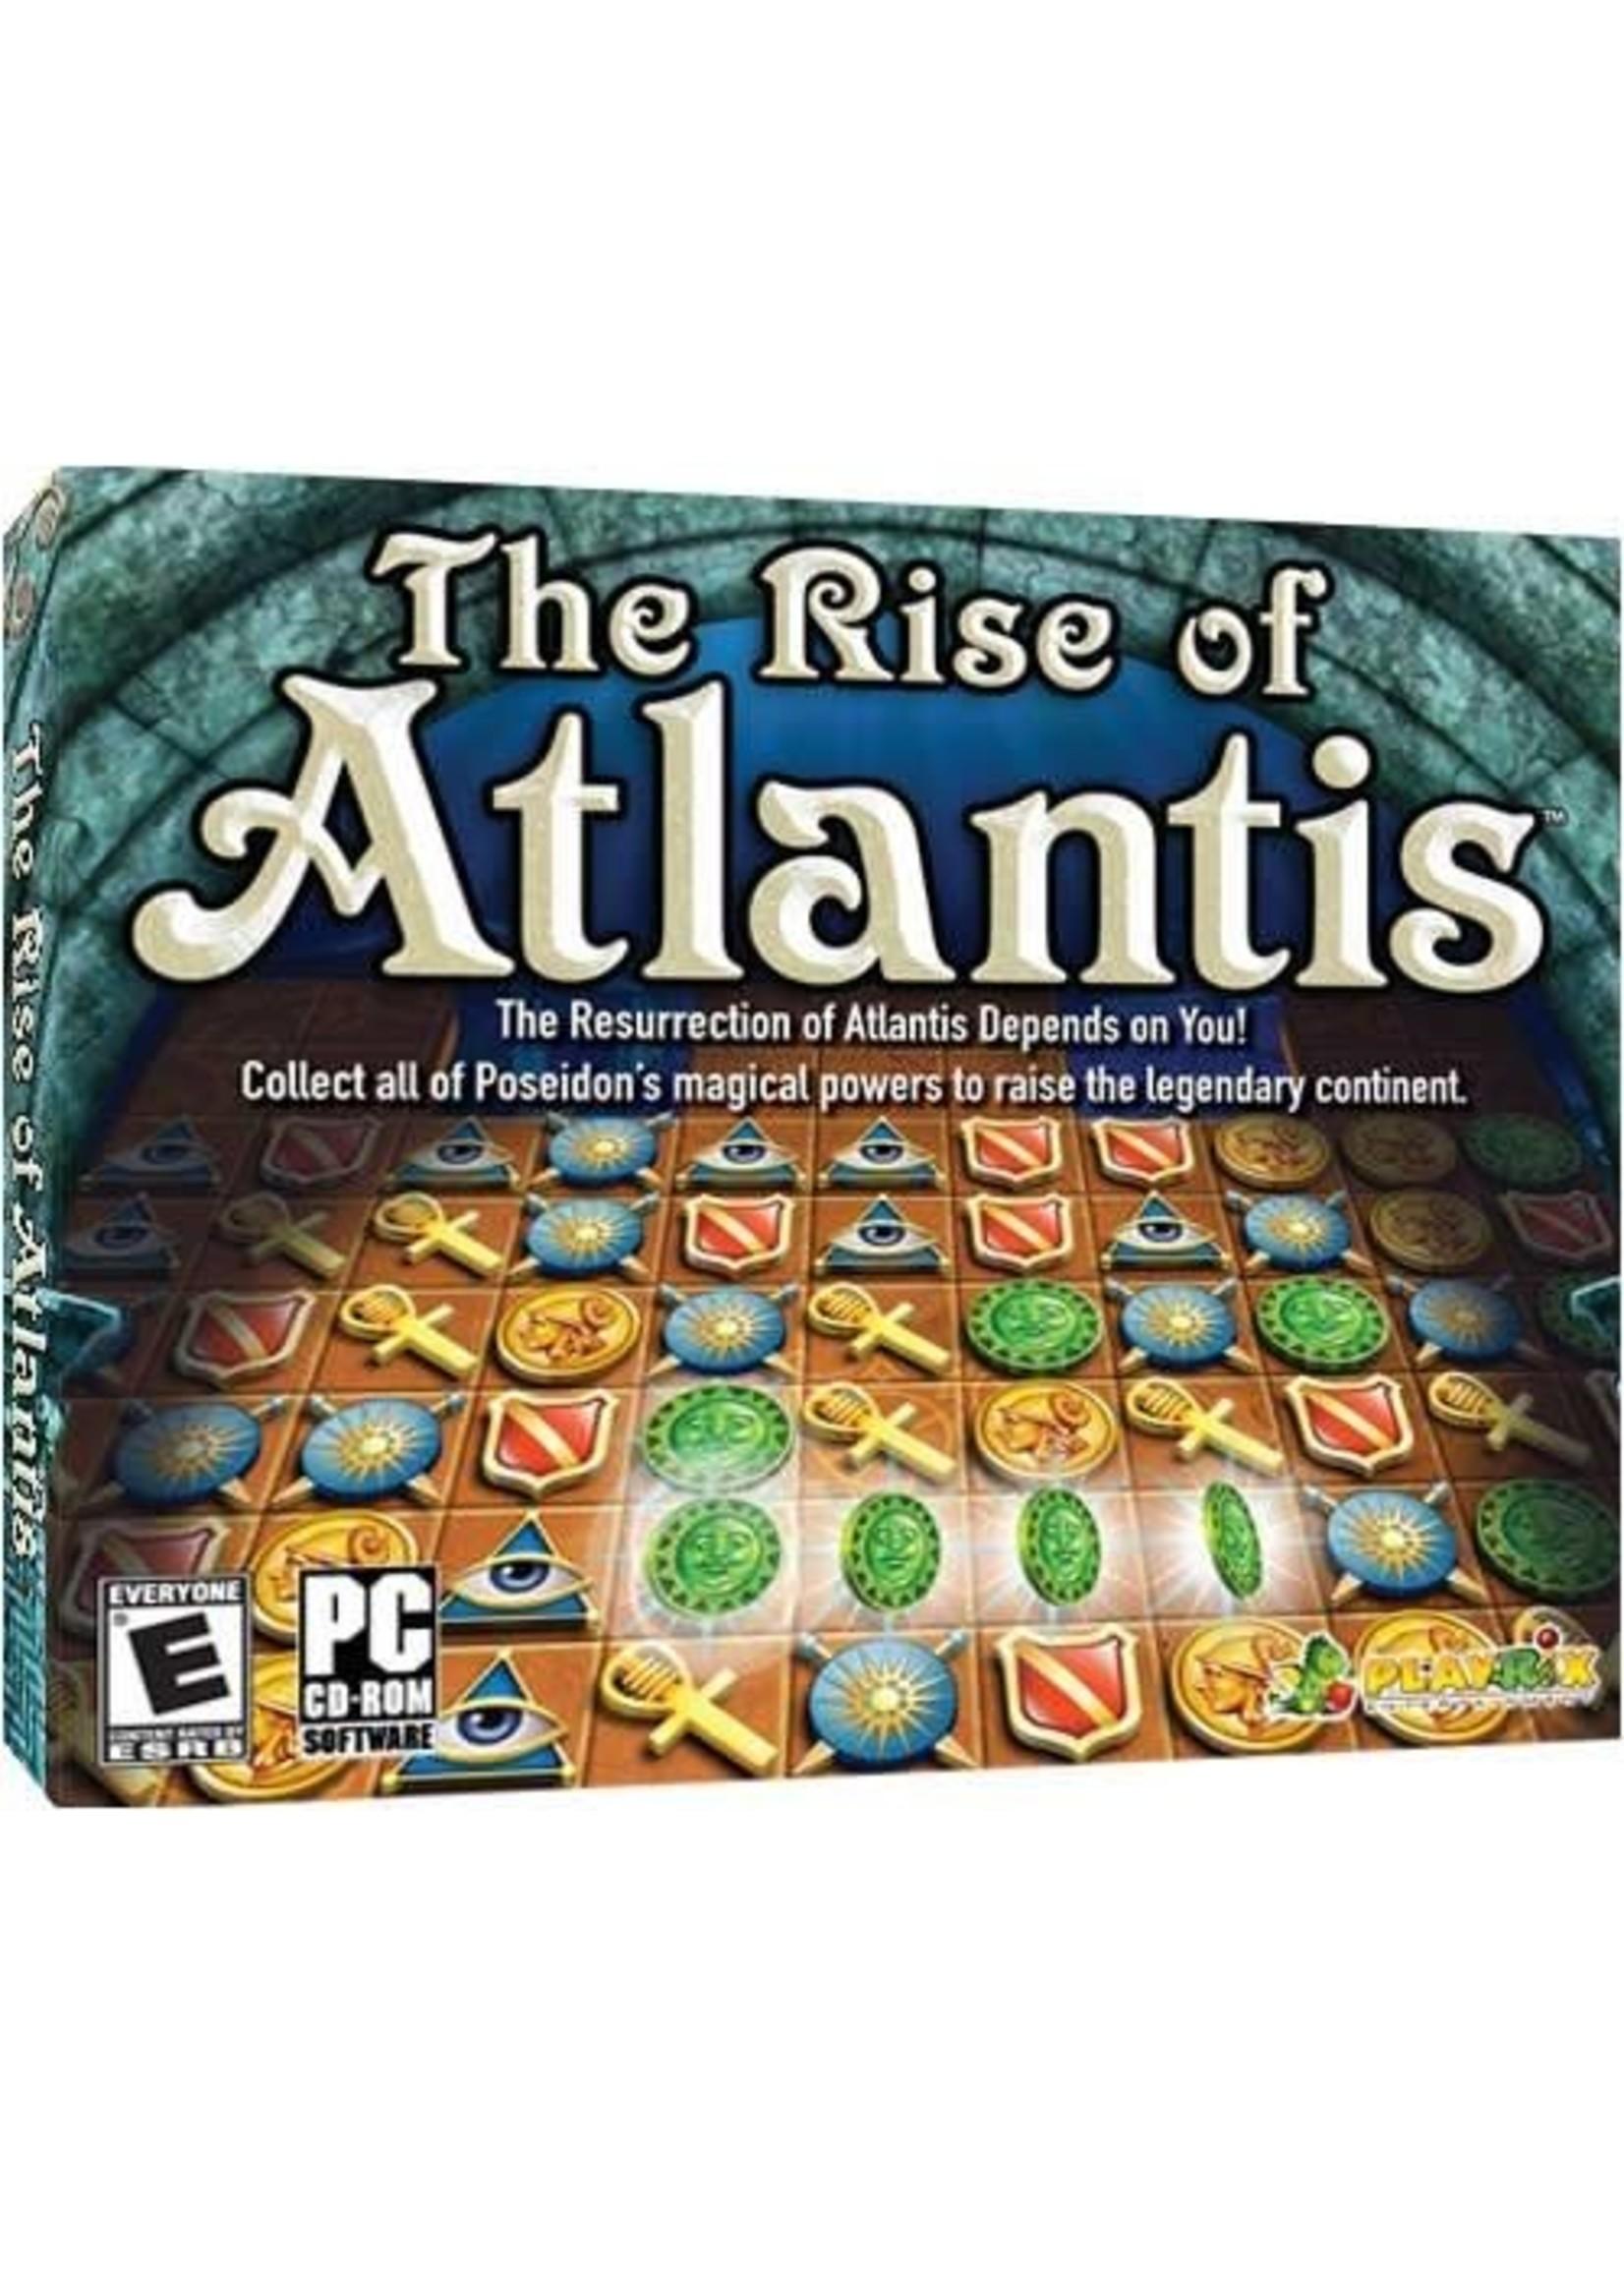 The Rise Of Atlantis PC Games